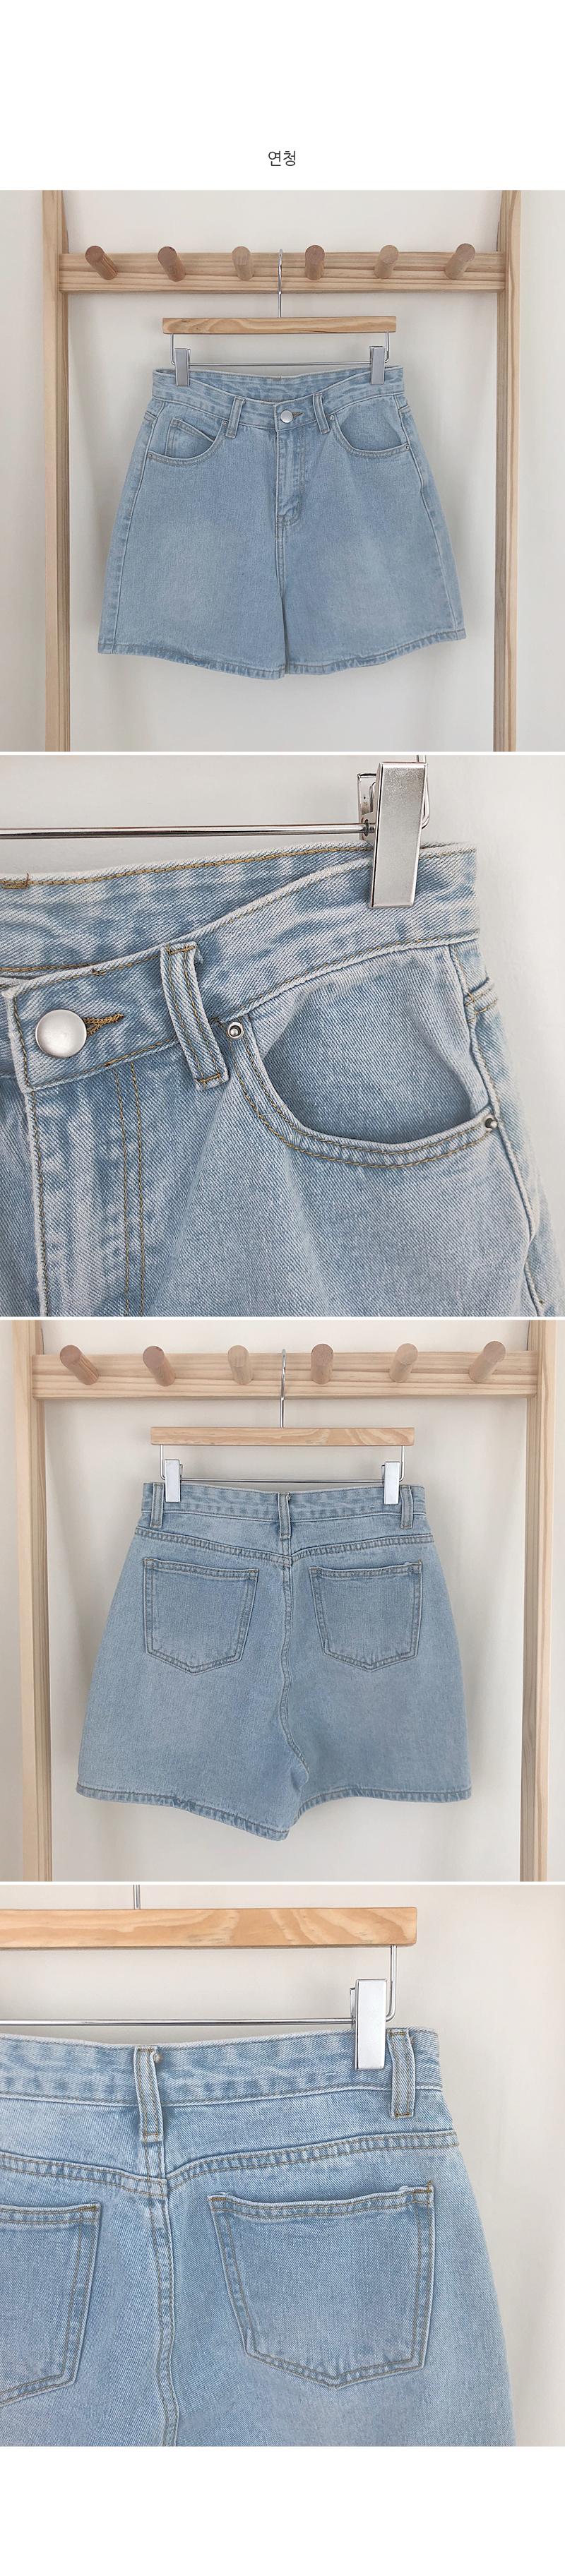 Semi A Light Blue denim short pants